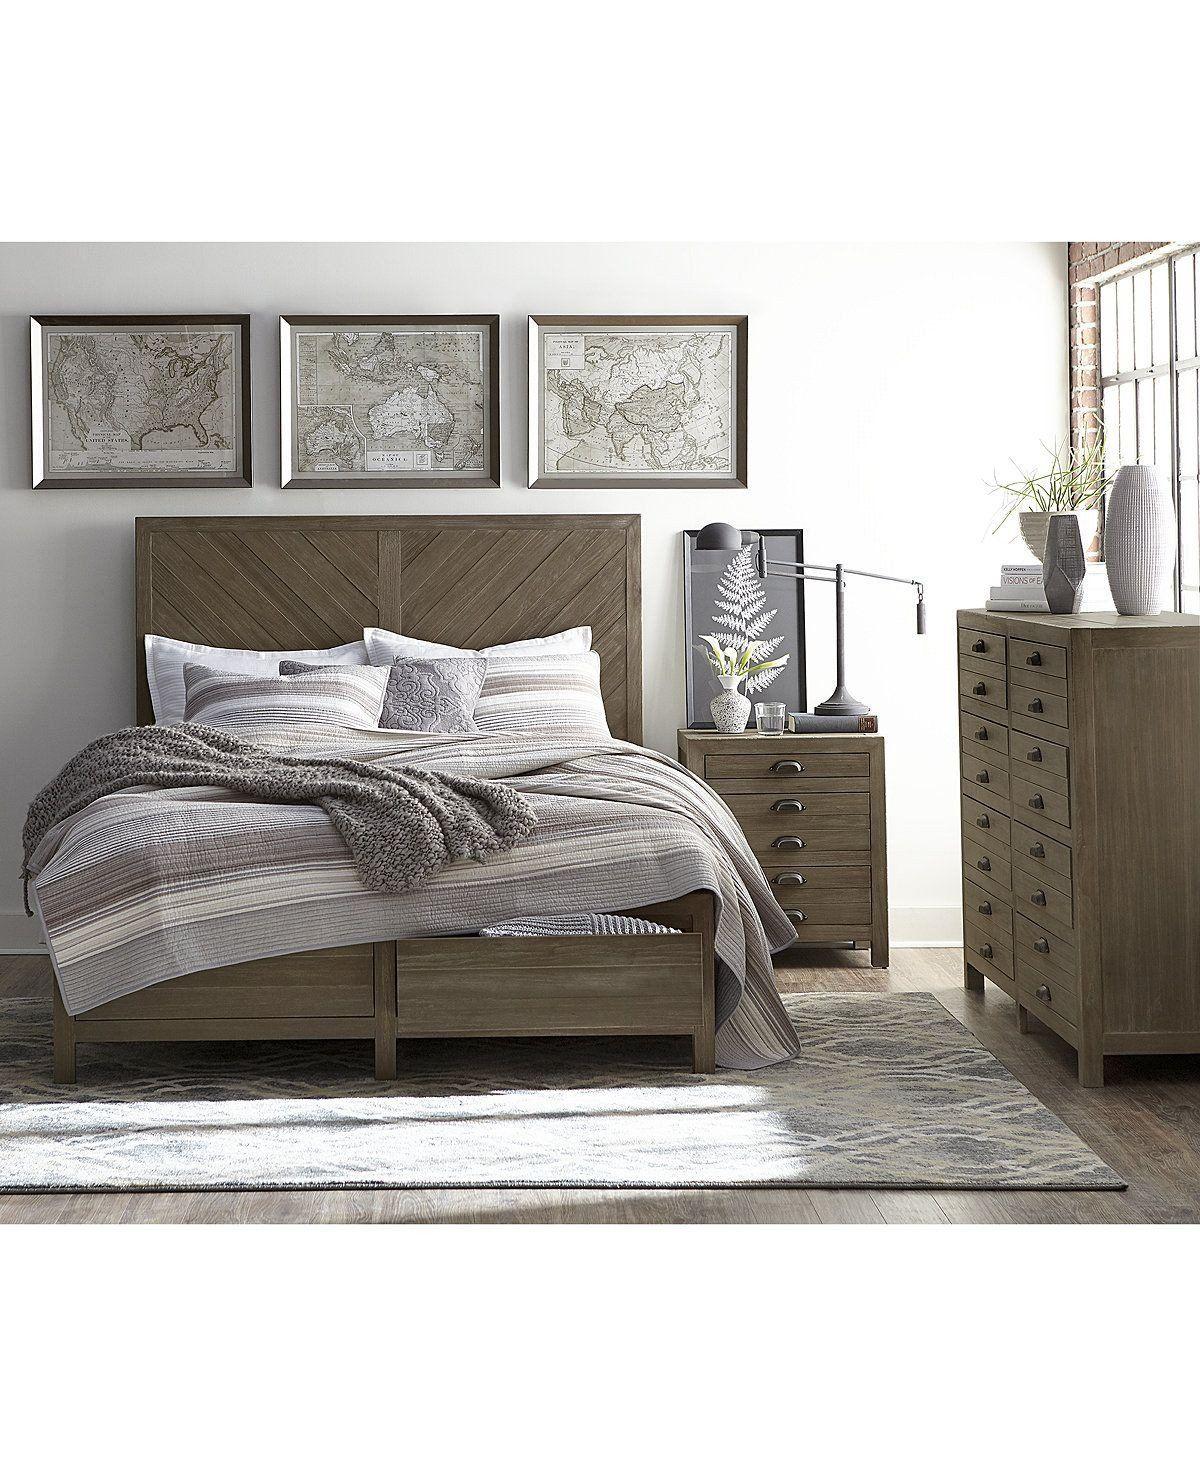 Full Bedroom Furniture Set Furniture Broadstone Storage